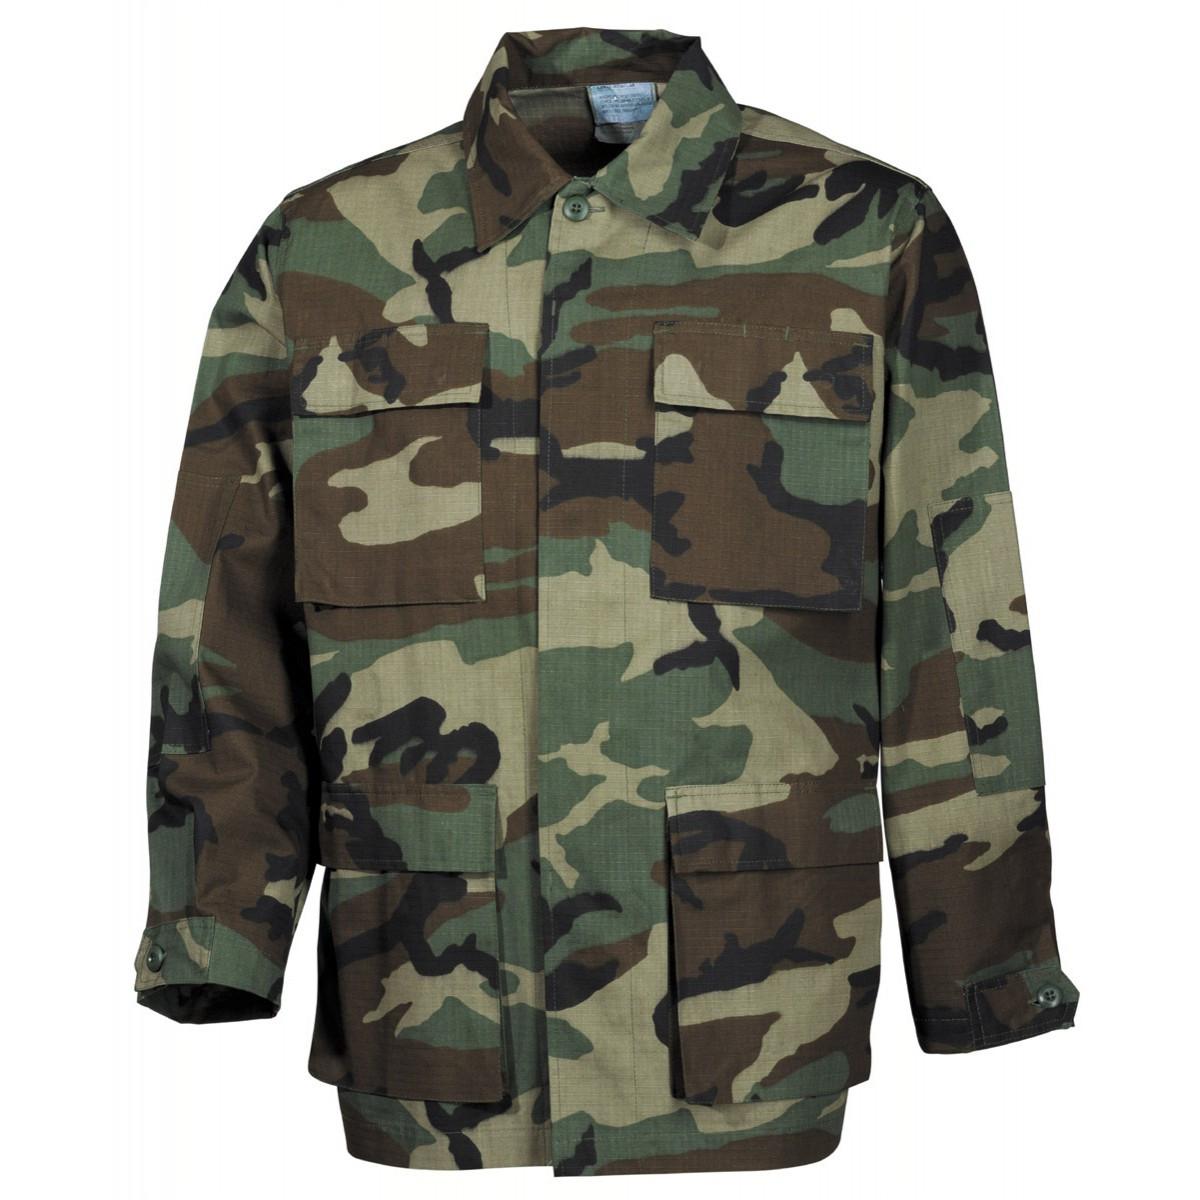 Vojaška jakna MFH US BDU 03334t